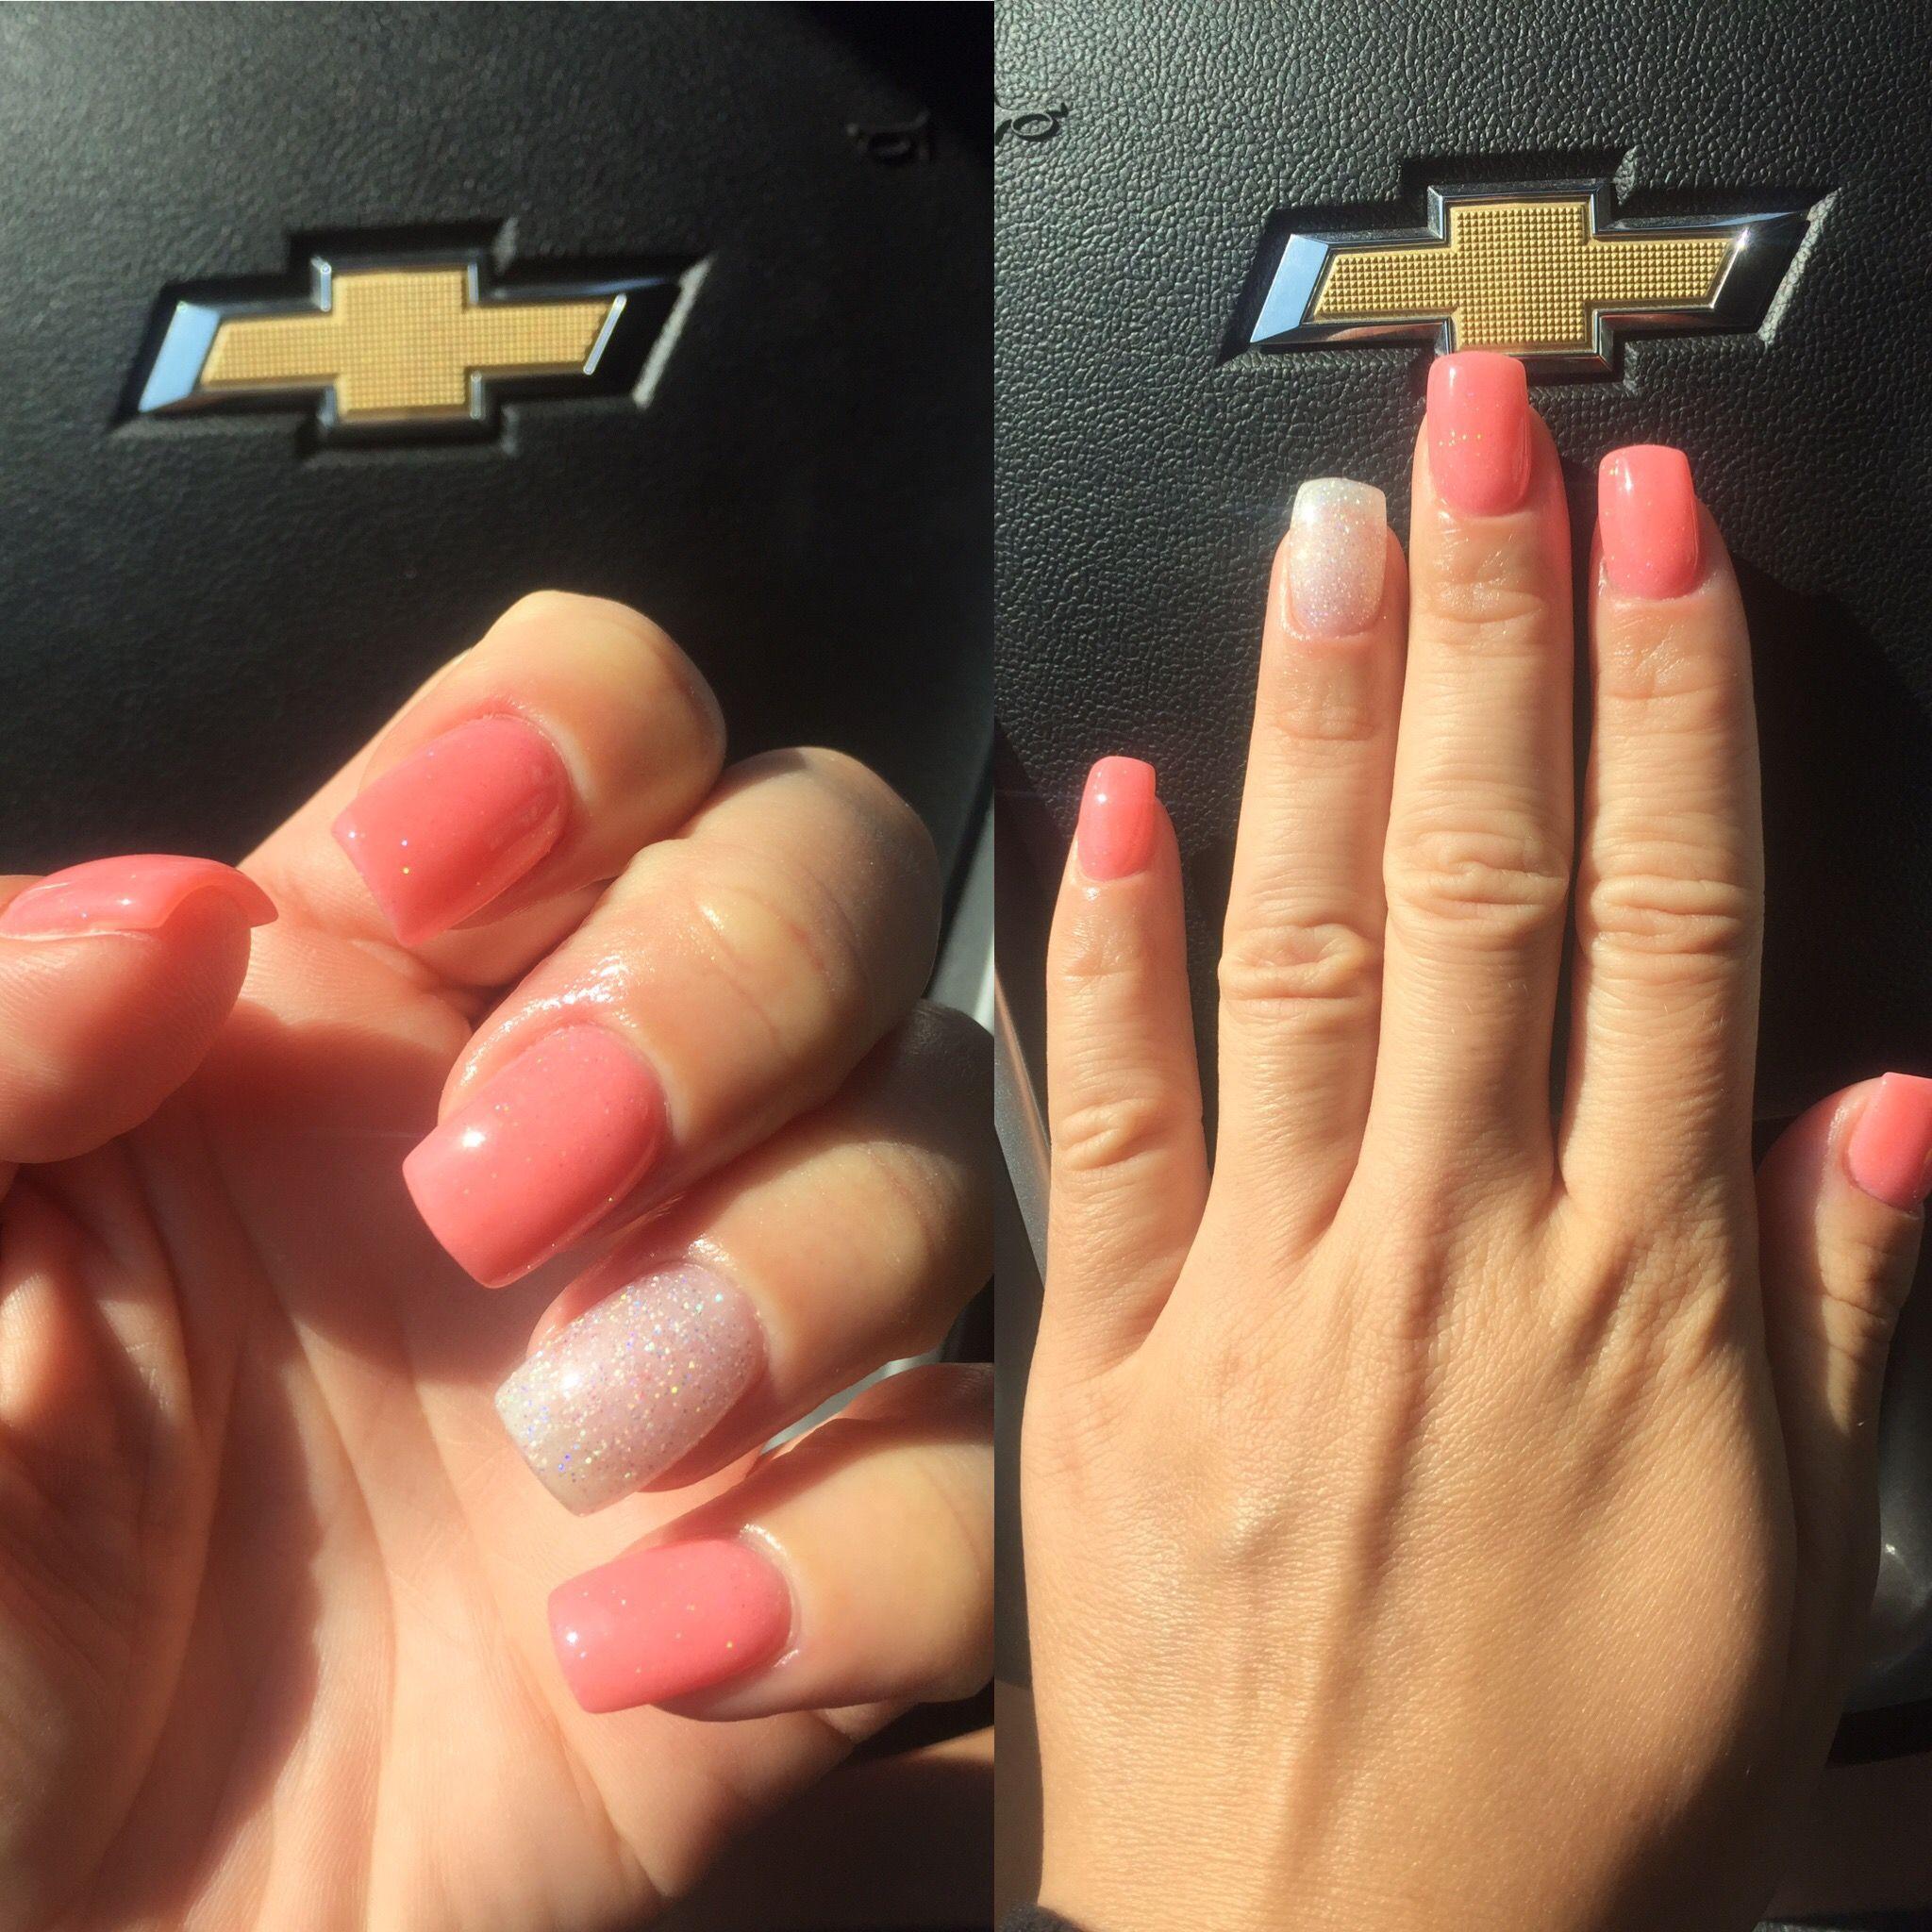 SNS Nails Coral & Glitter   My SNS Nails   Pinterest   Sns nails